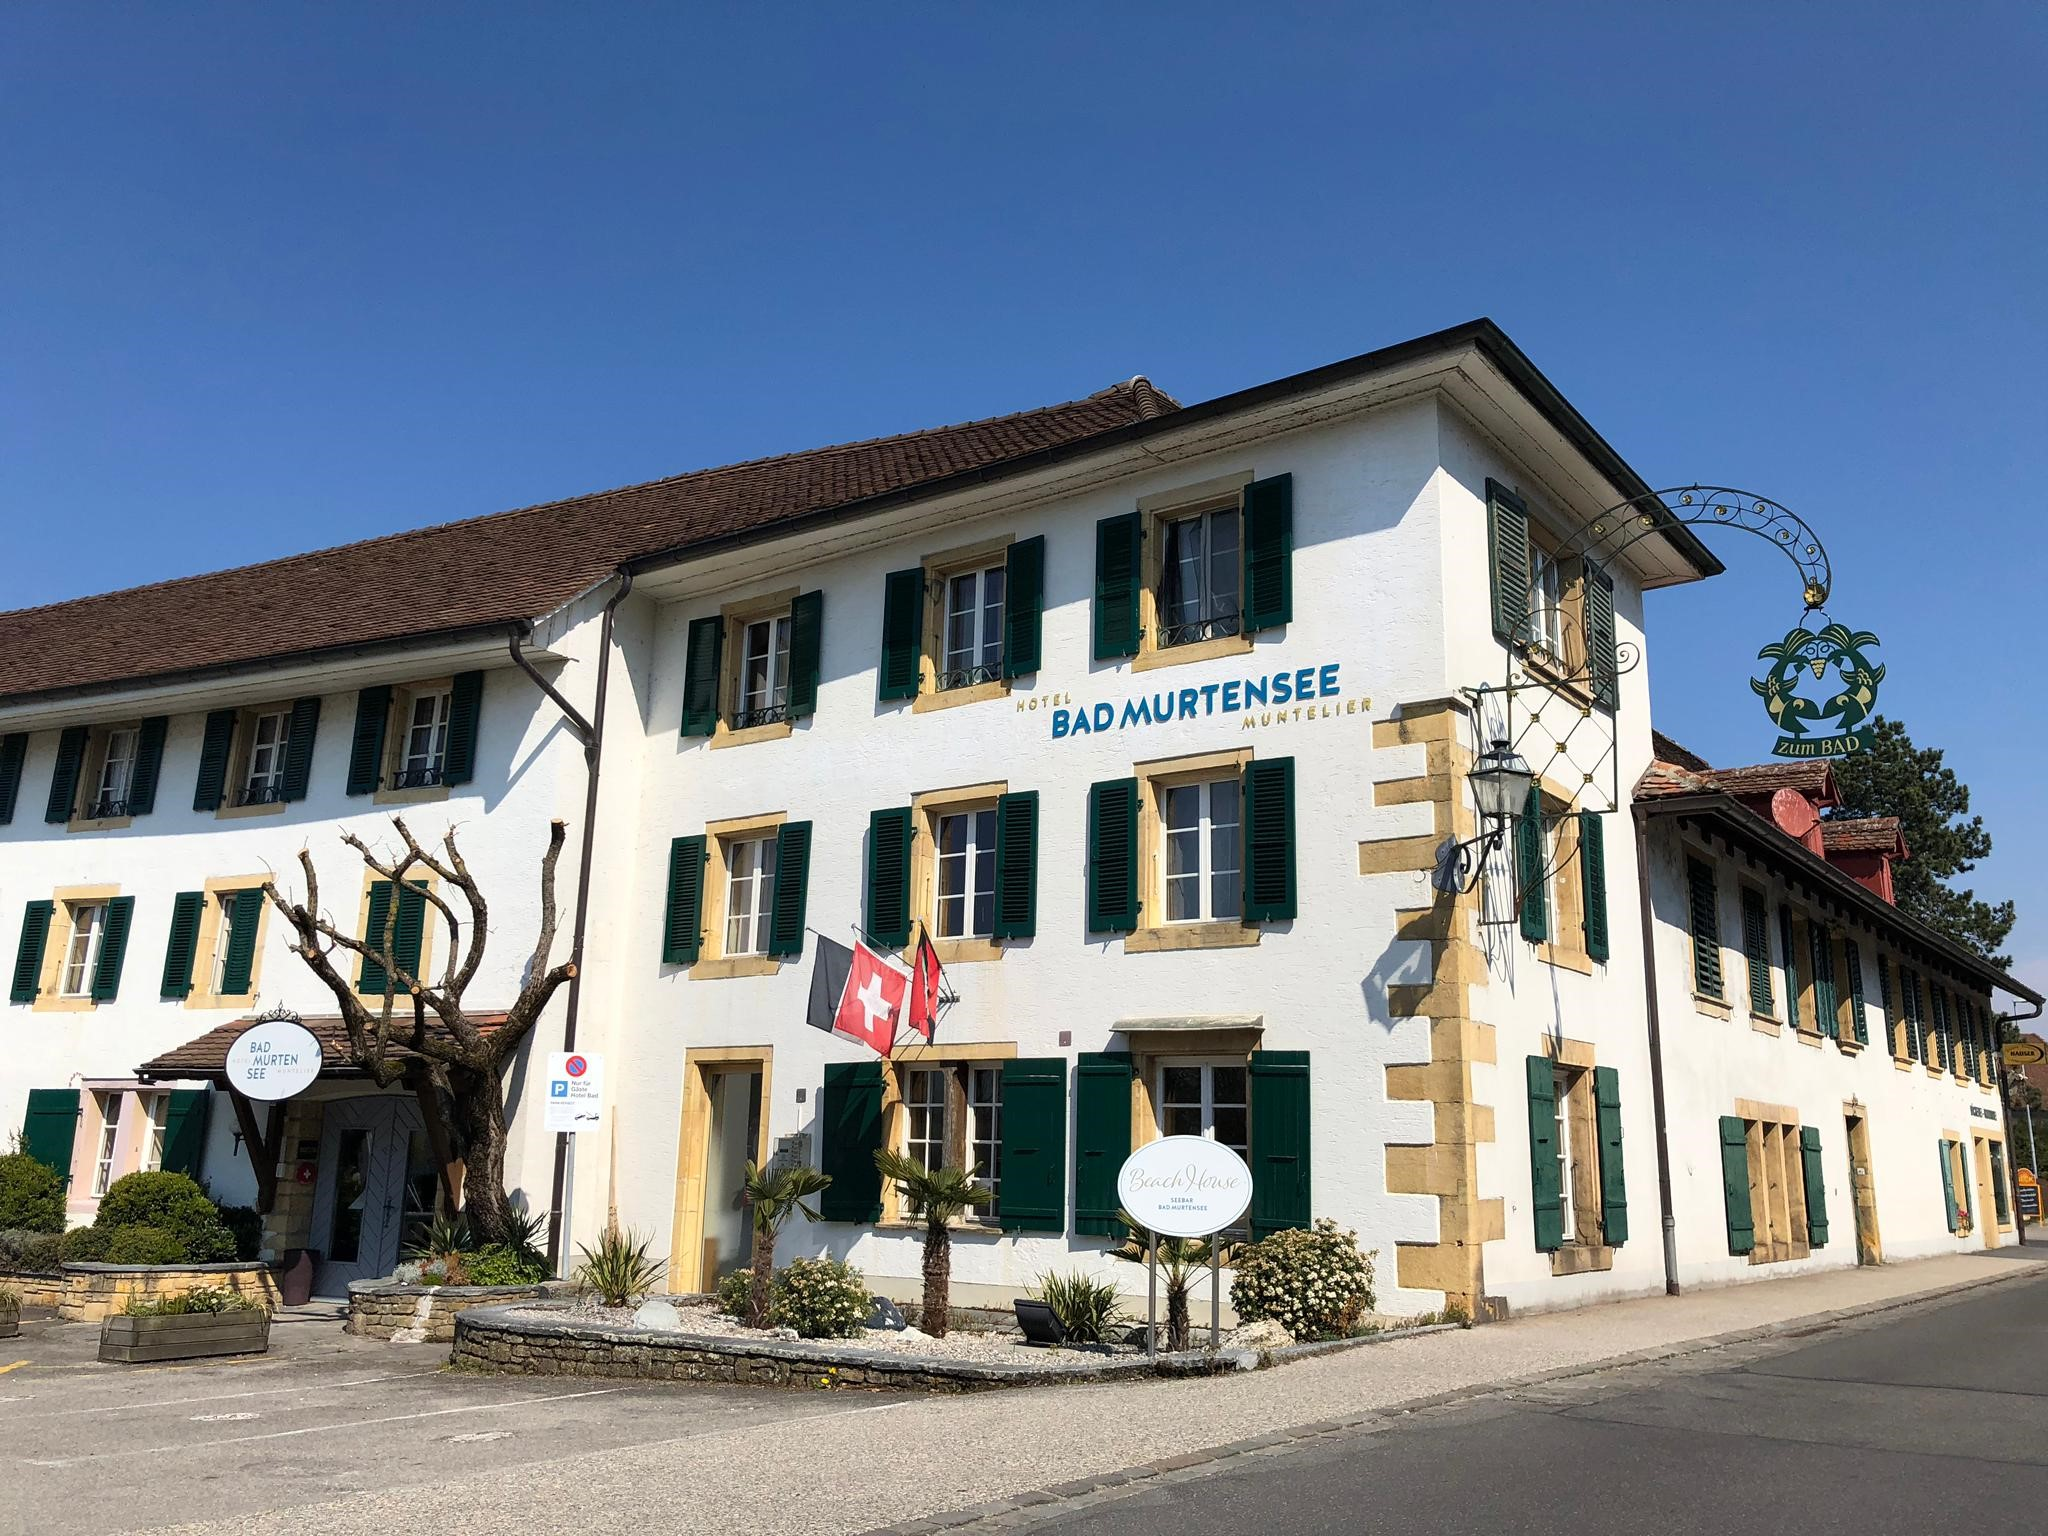 Hotel Bad Murtensee 1